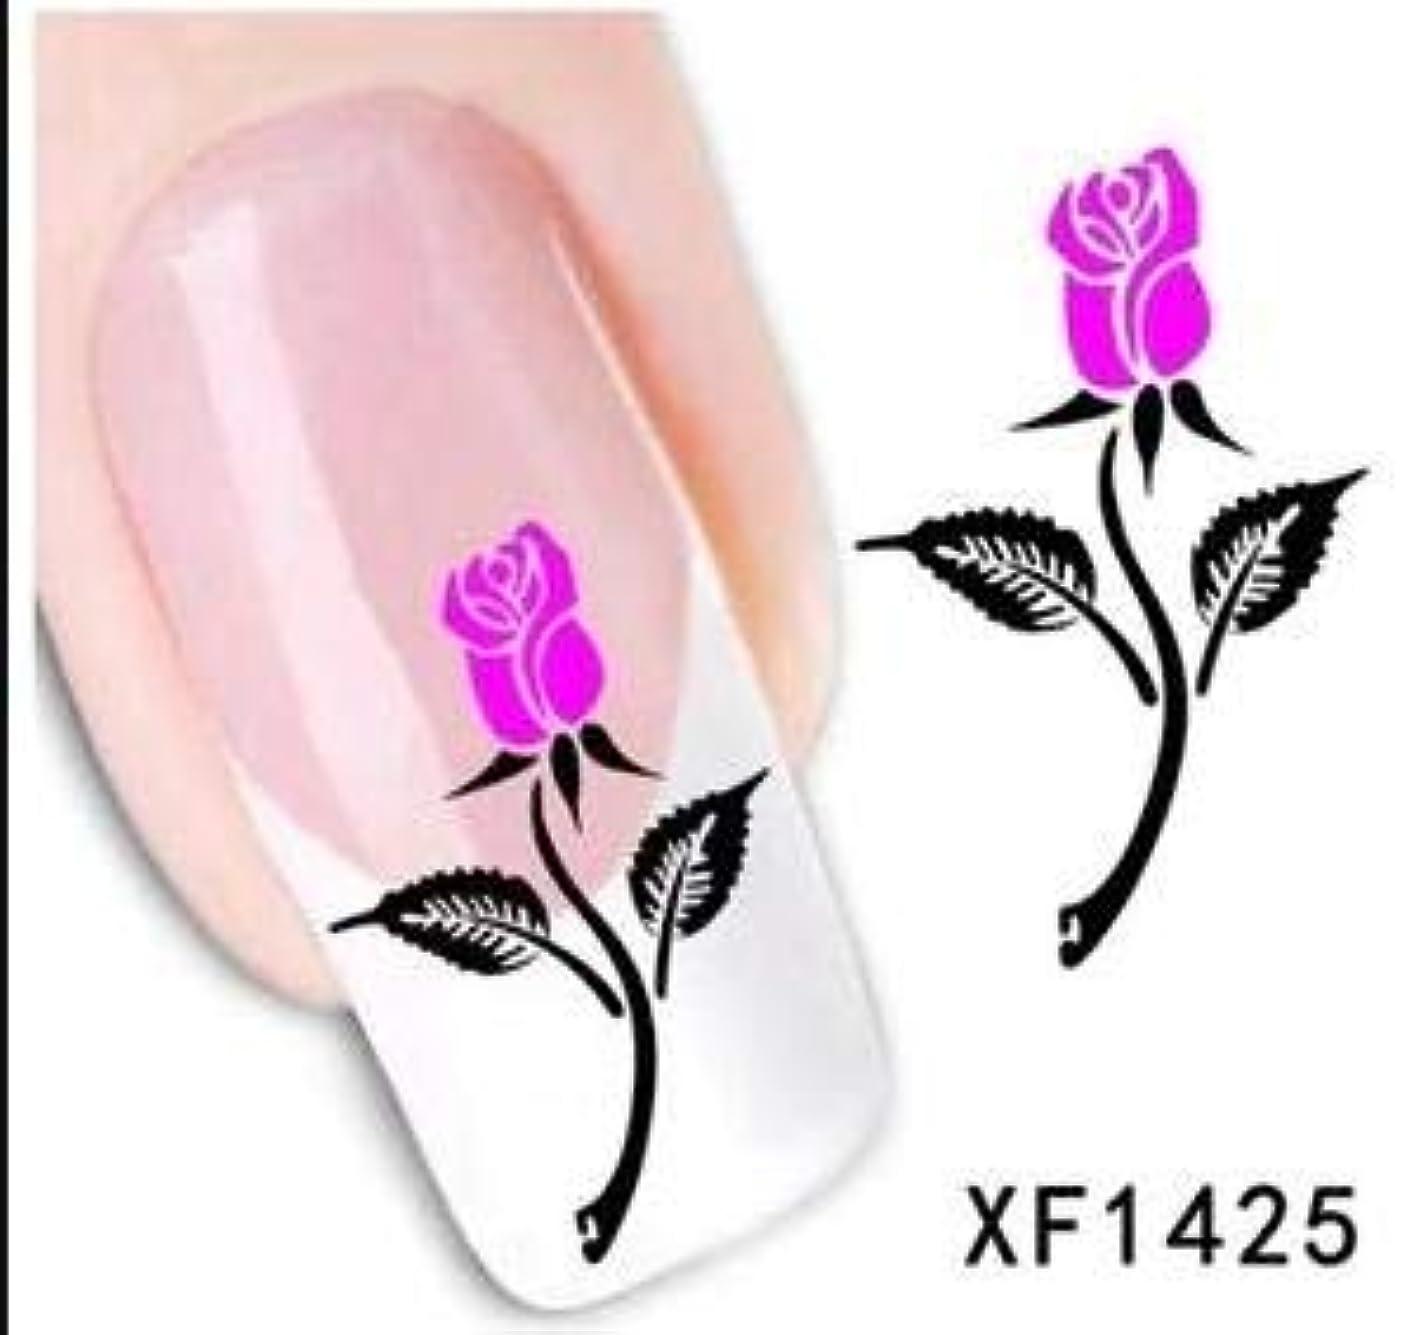 Yan 5個ファッションマニキュアデカール花柄デザイン水転写ステッカー(XF1422) (色 : XF1425)